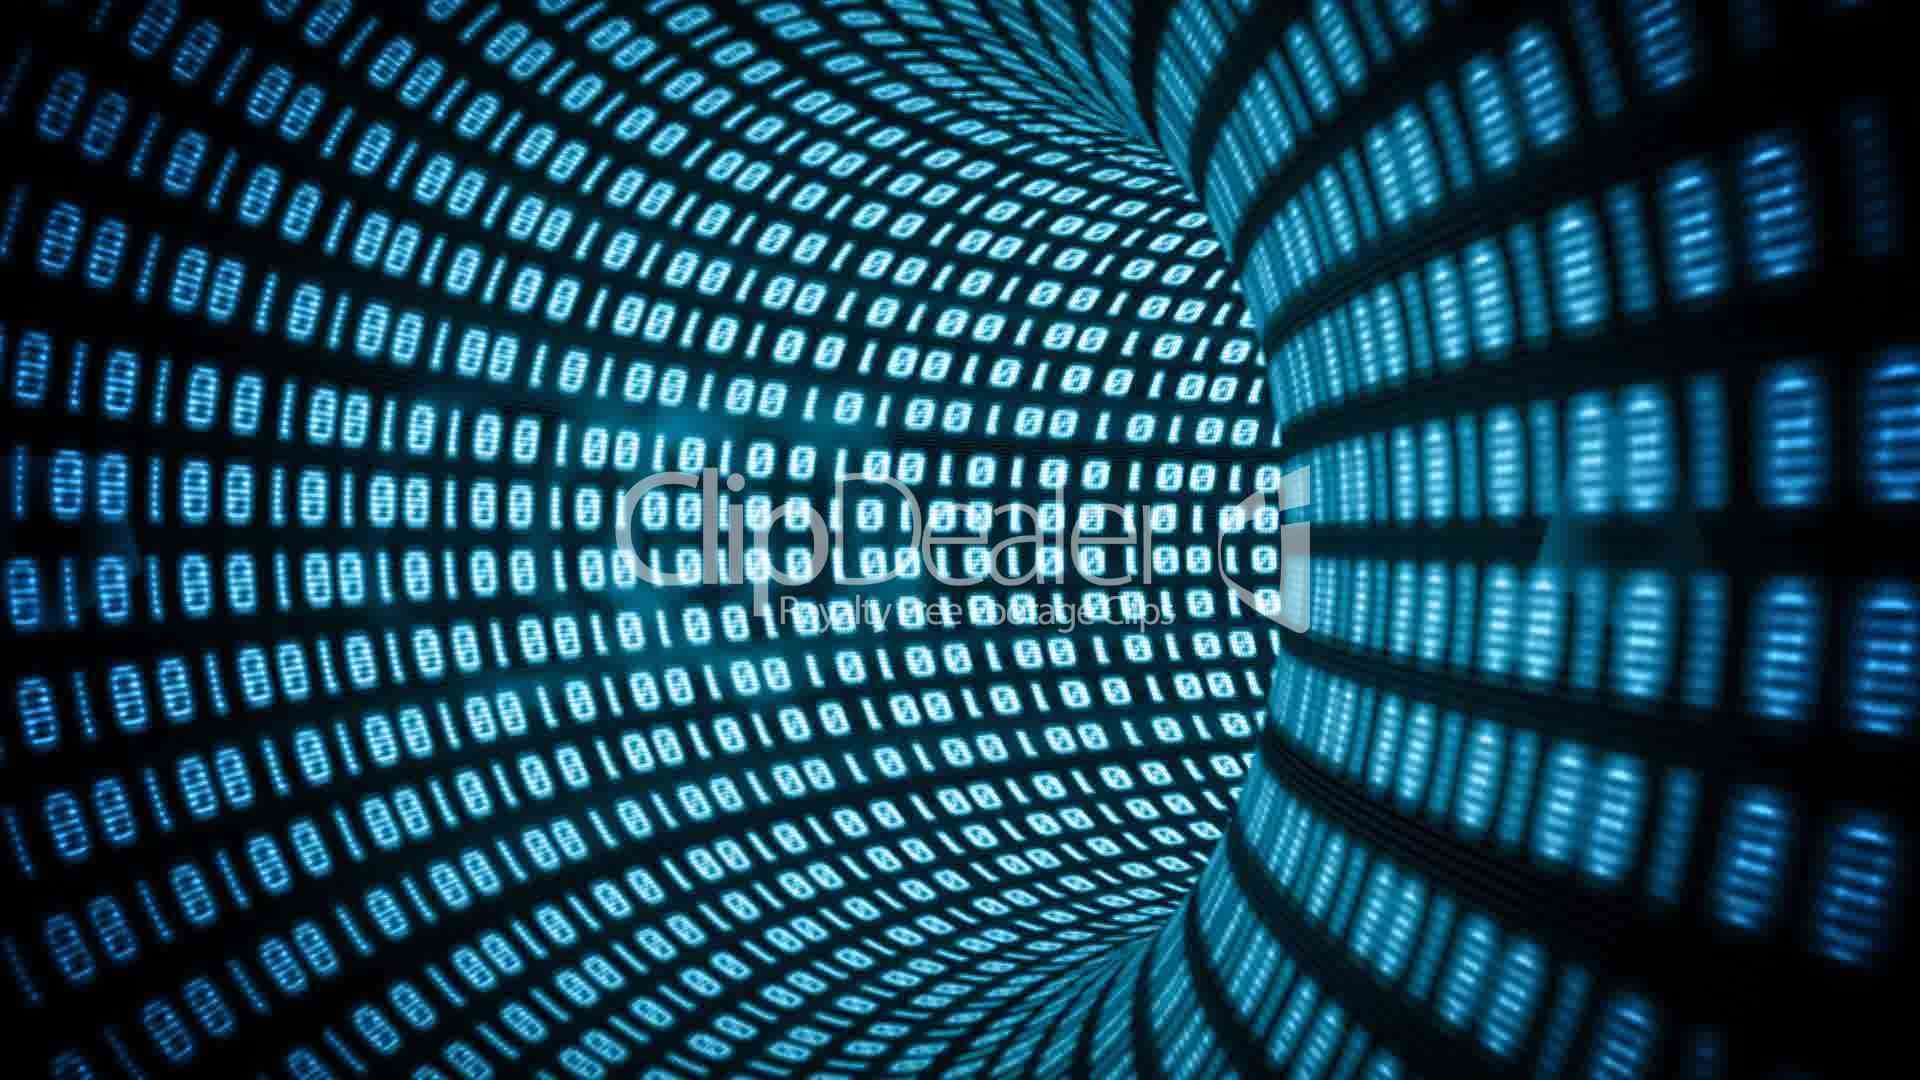 12--231894-Binary internet tunnel